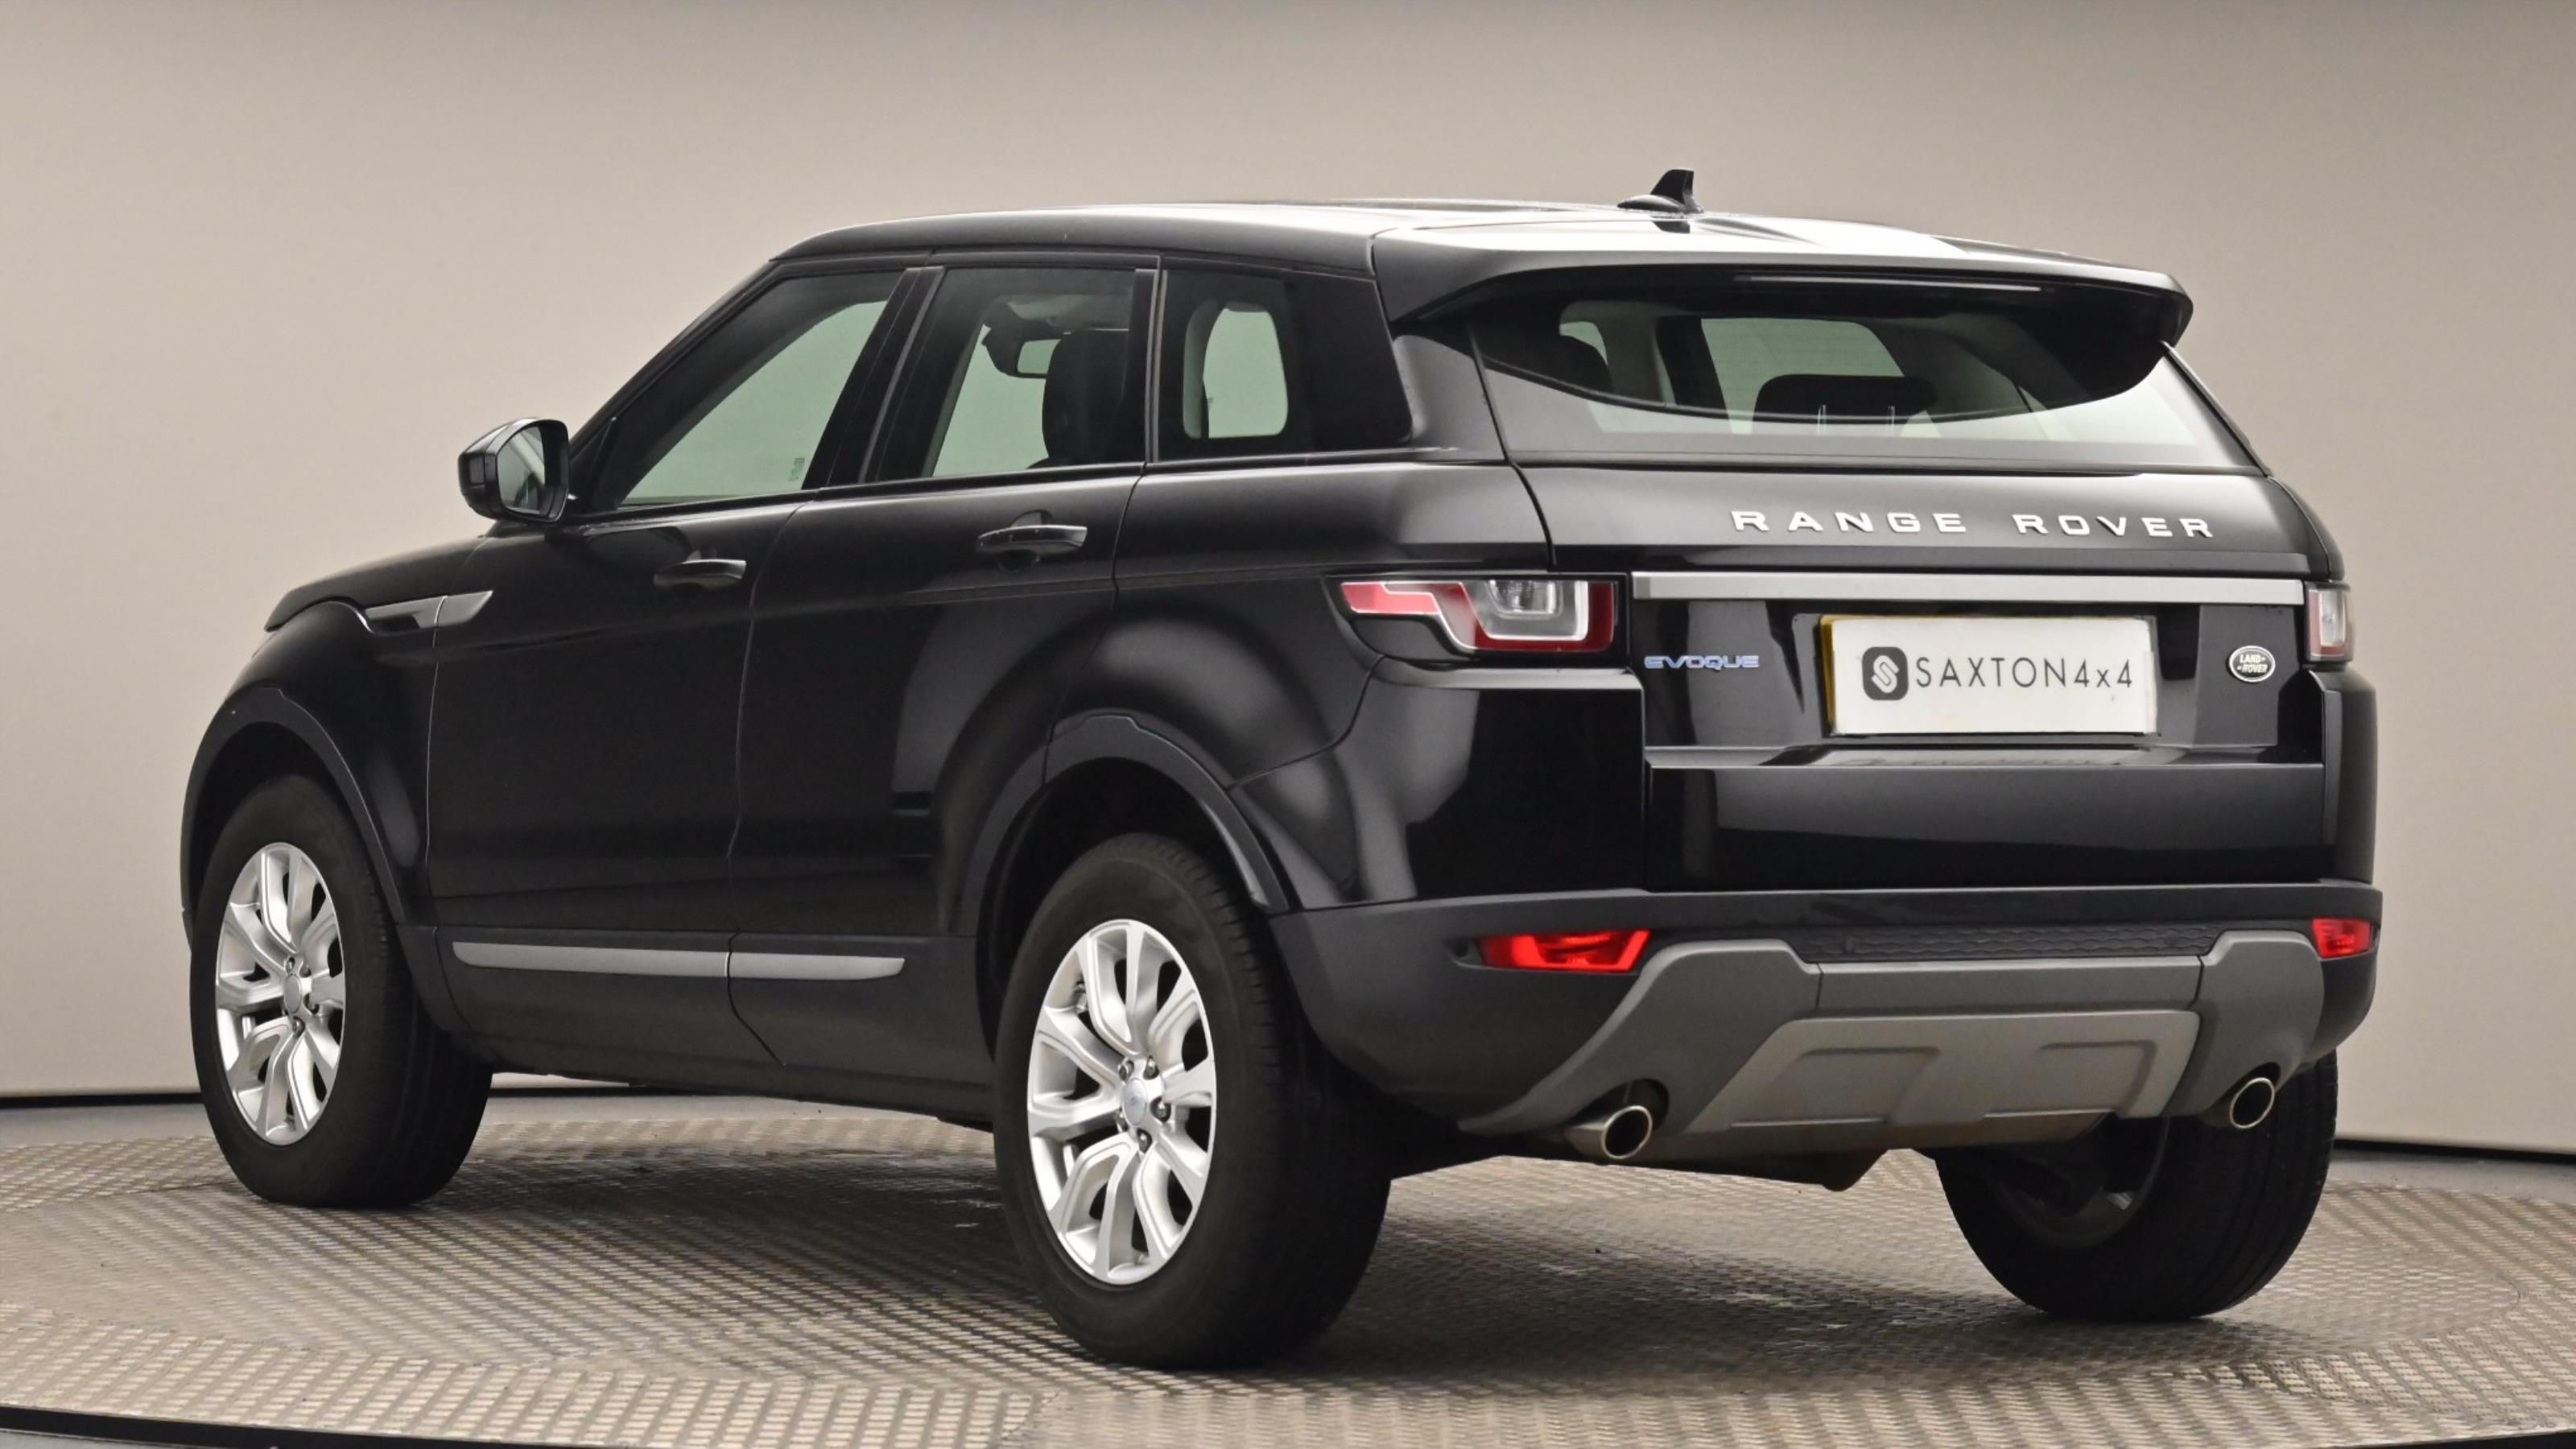 Used 15 Land Rover RANGE ROVER EVOQUE 2.0 eD4 SE 5dr 2WD Black at Saxton4x4